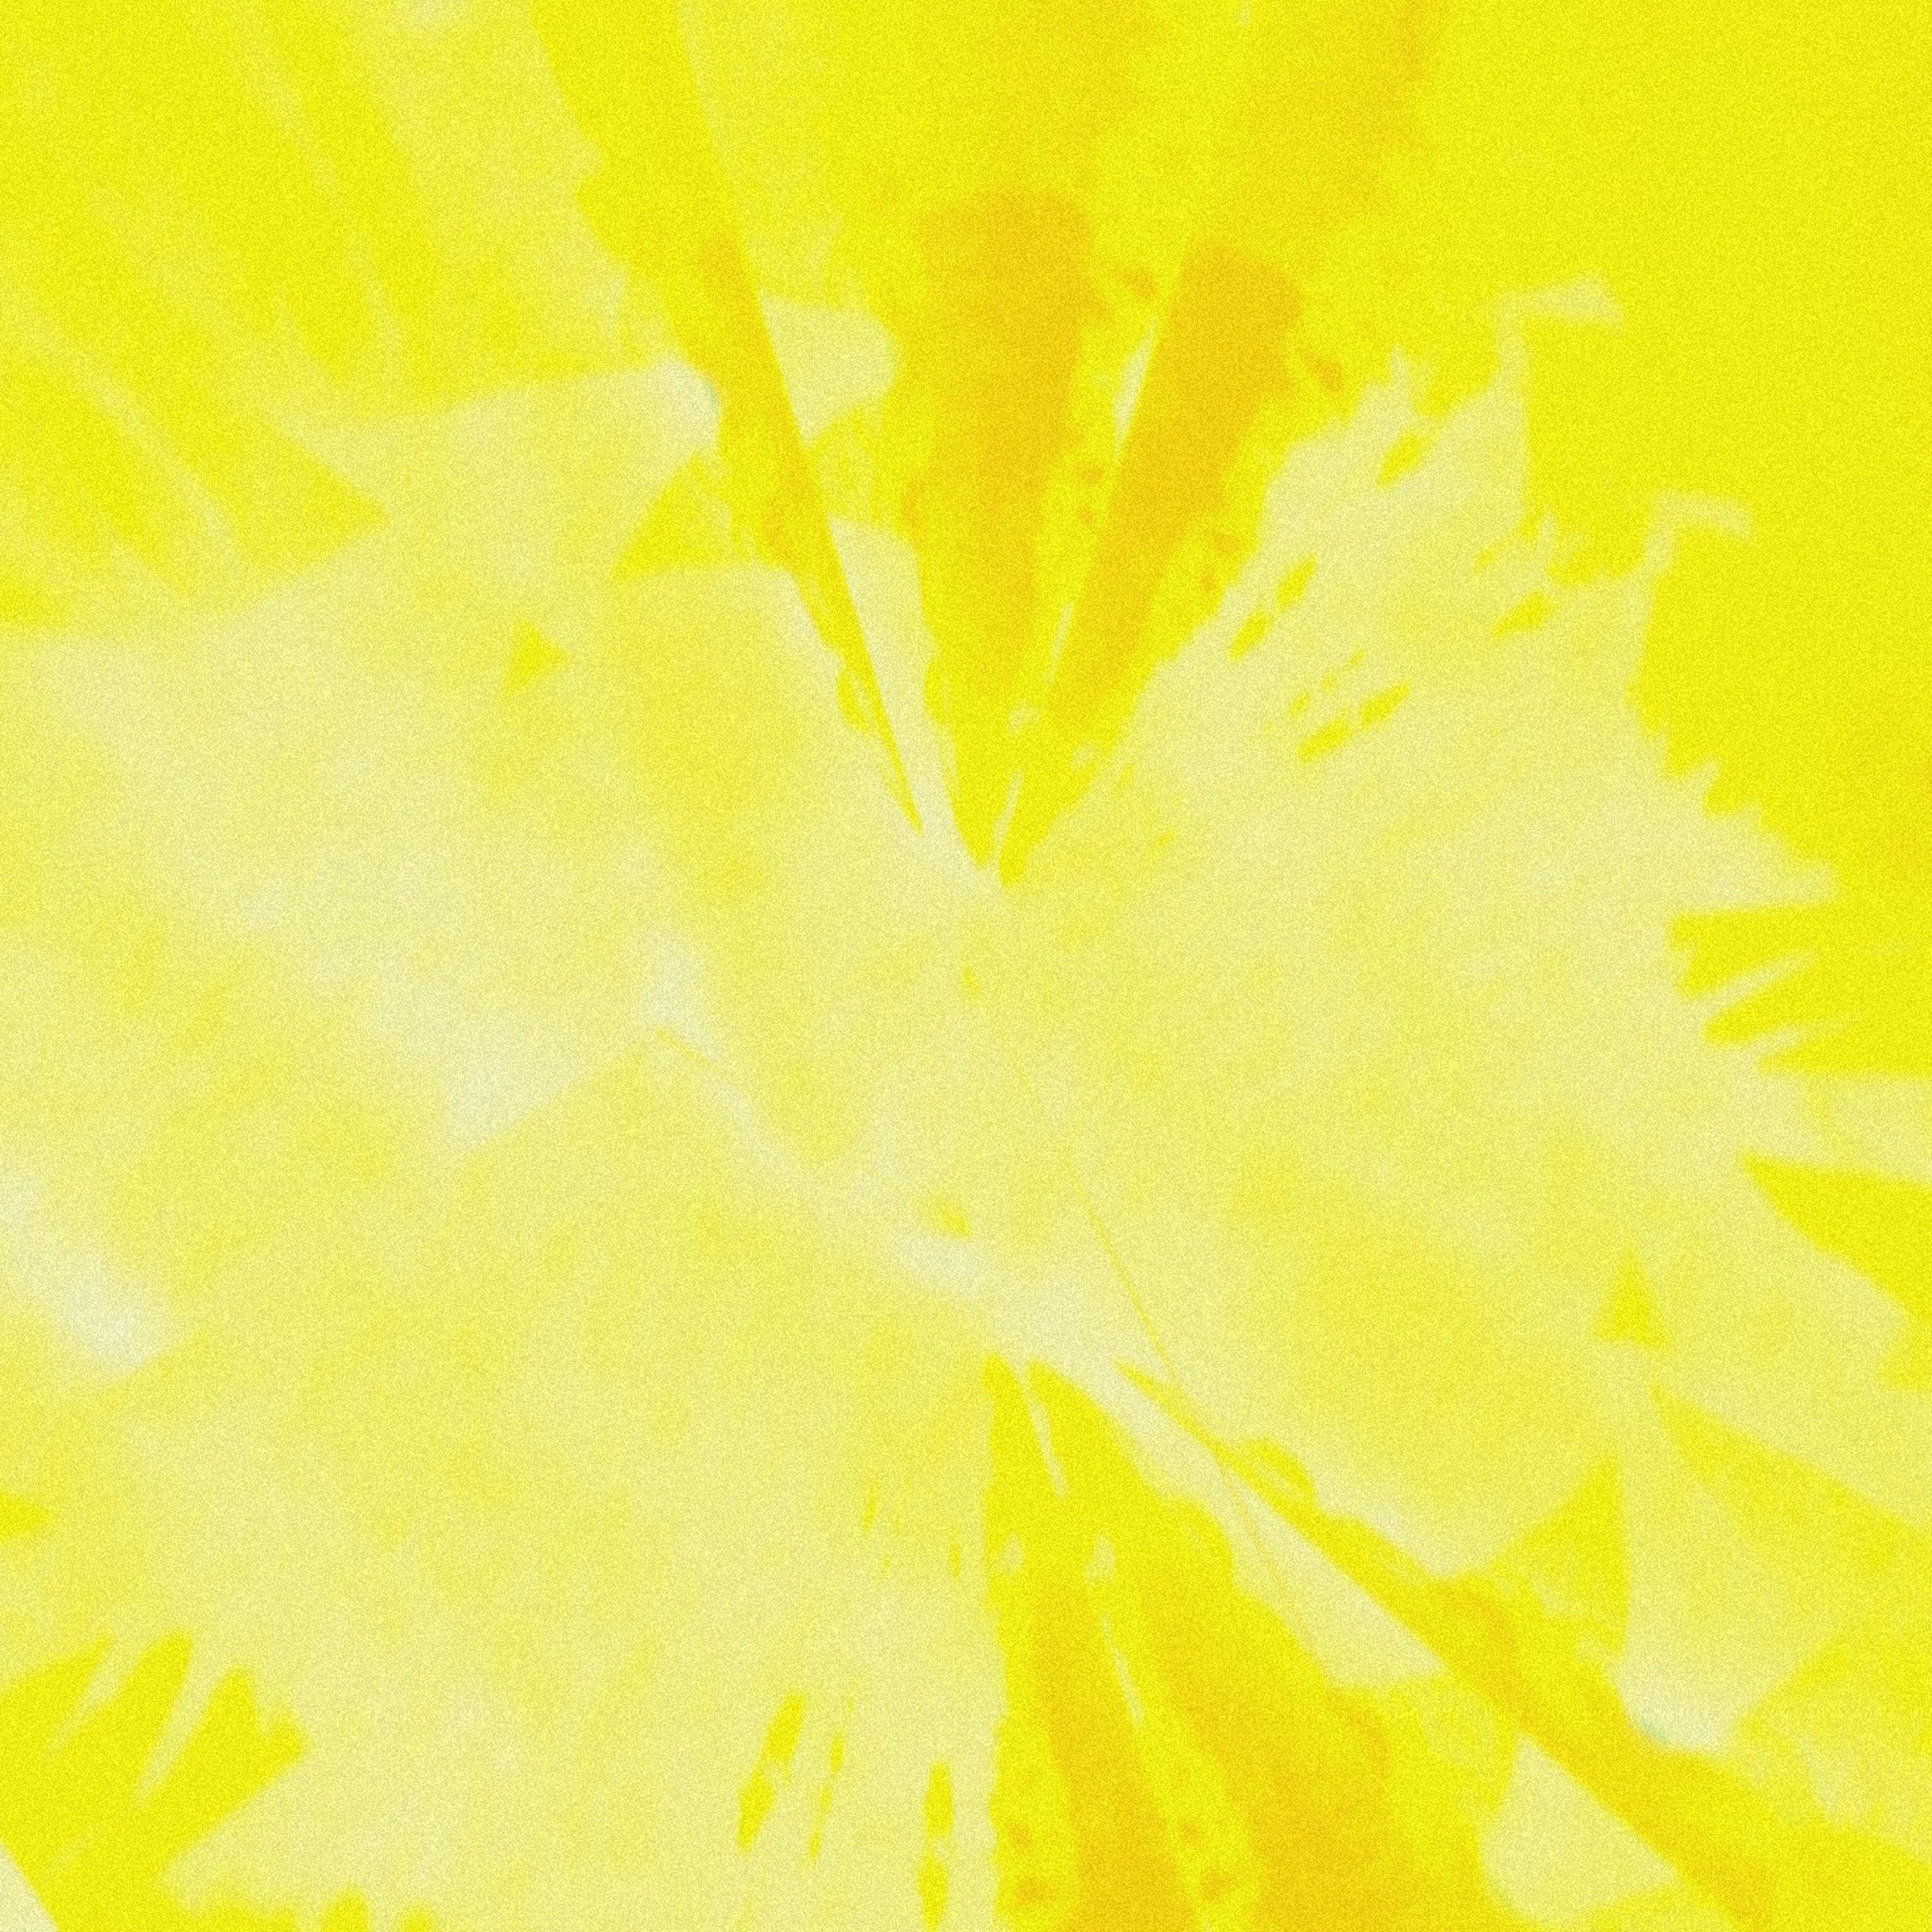 rays - seventhgaze